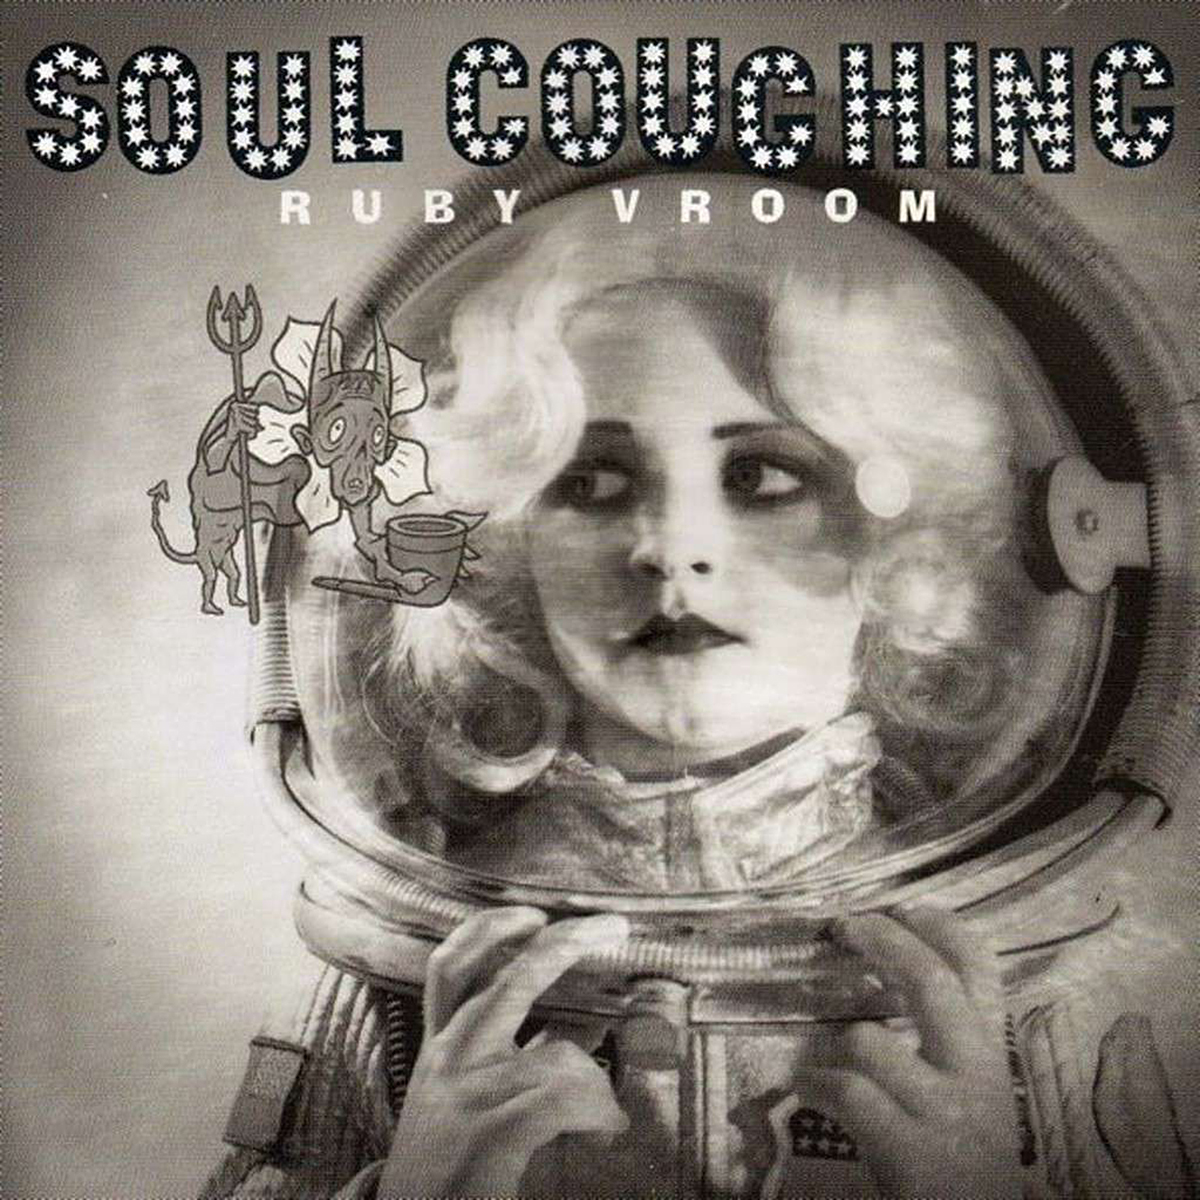 Ruby Vroom de Soul Coughing